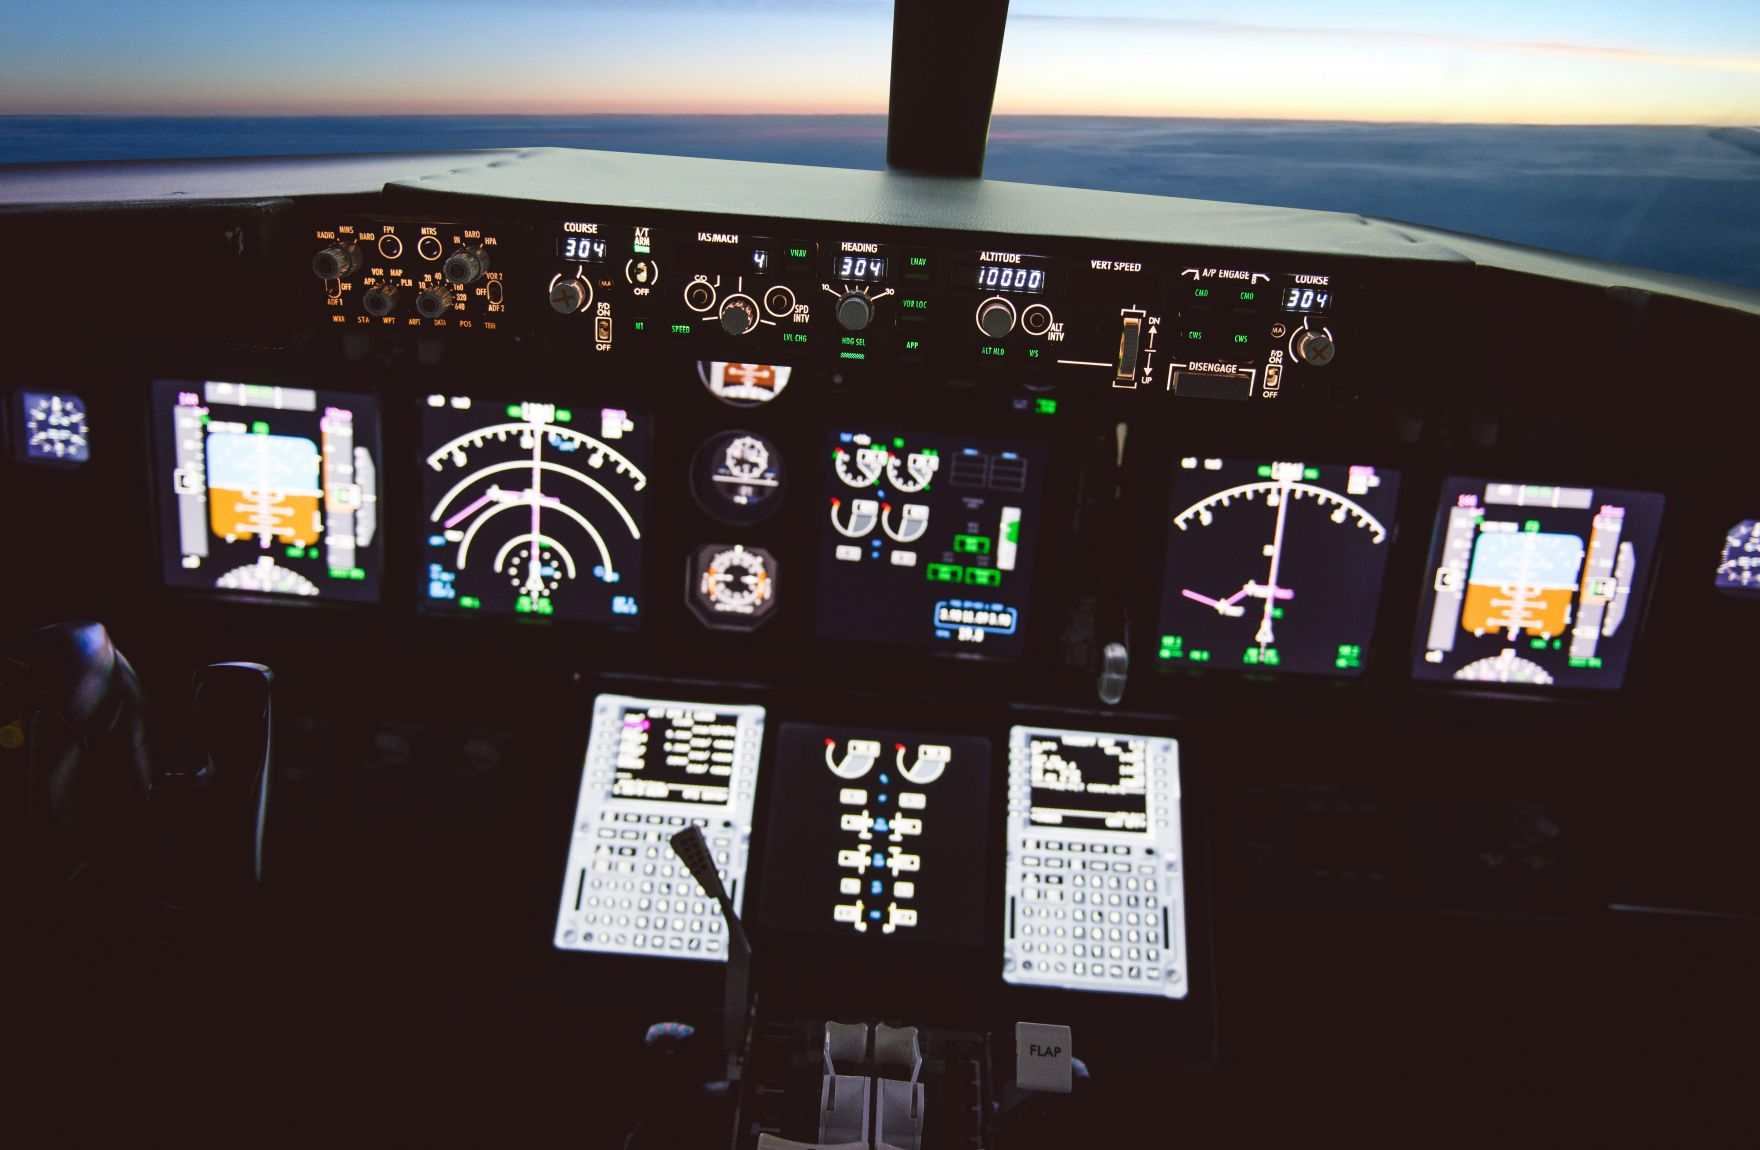 AirWine_letecky simulator